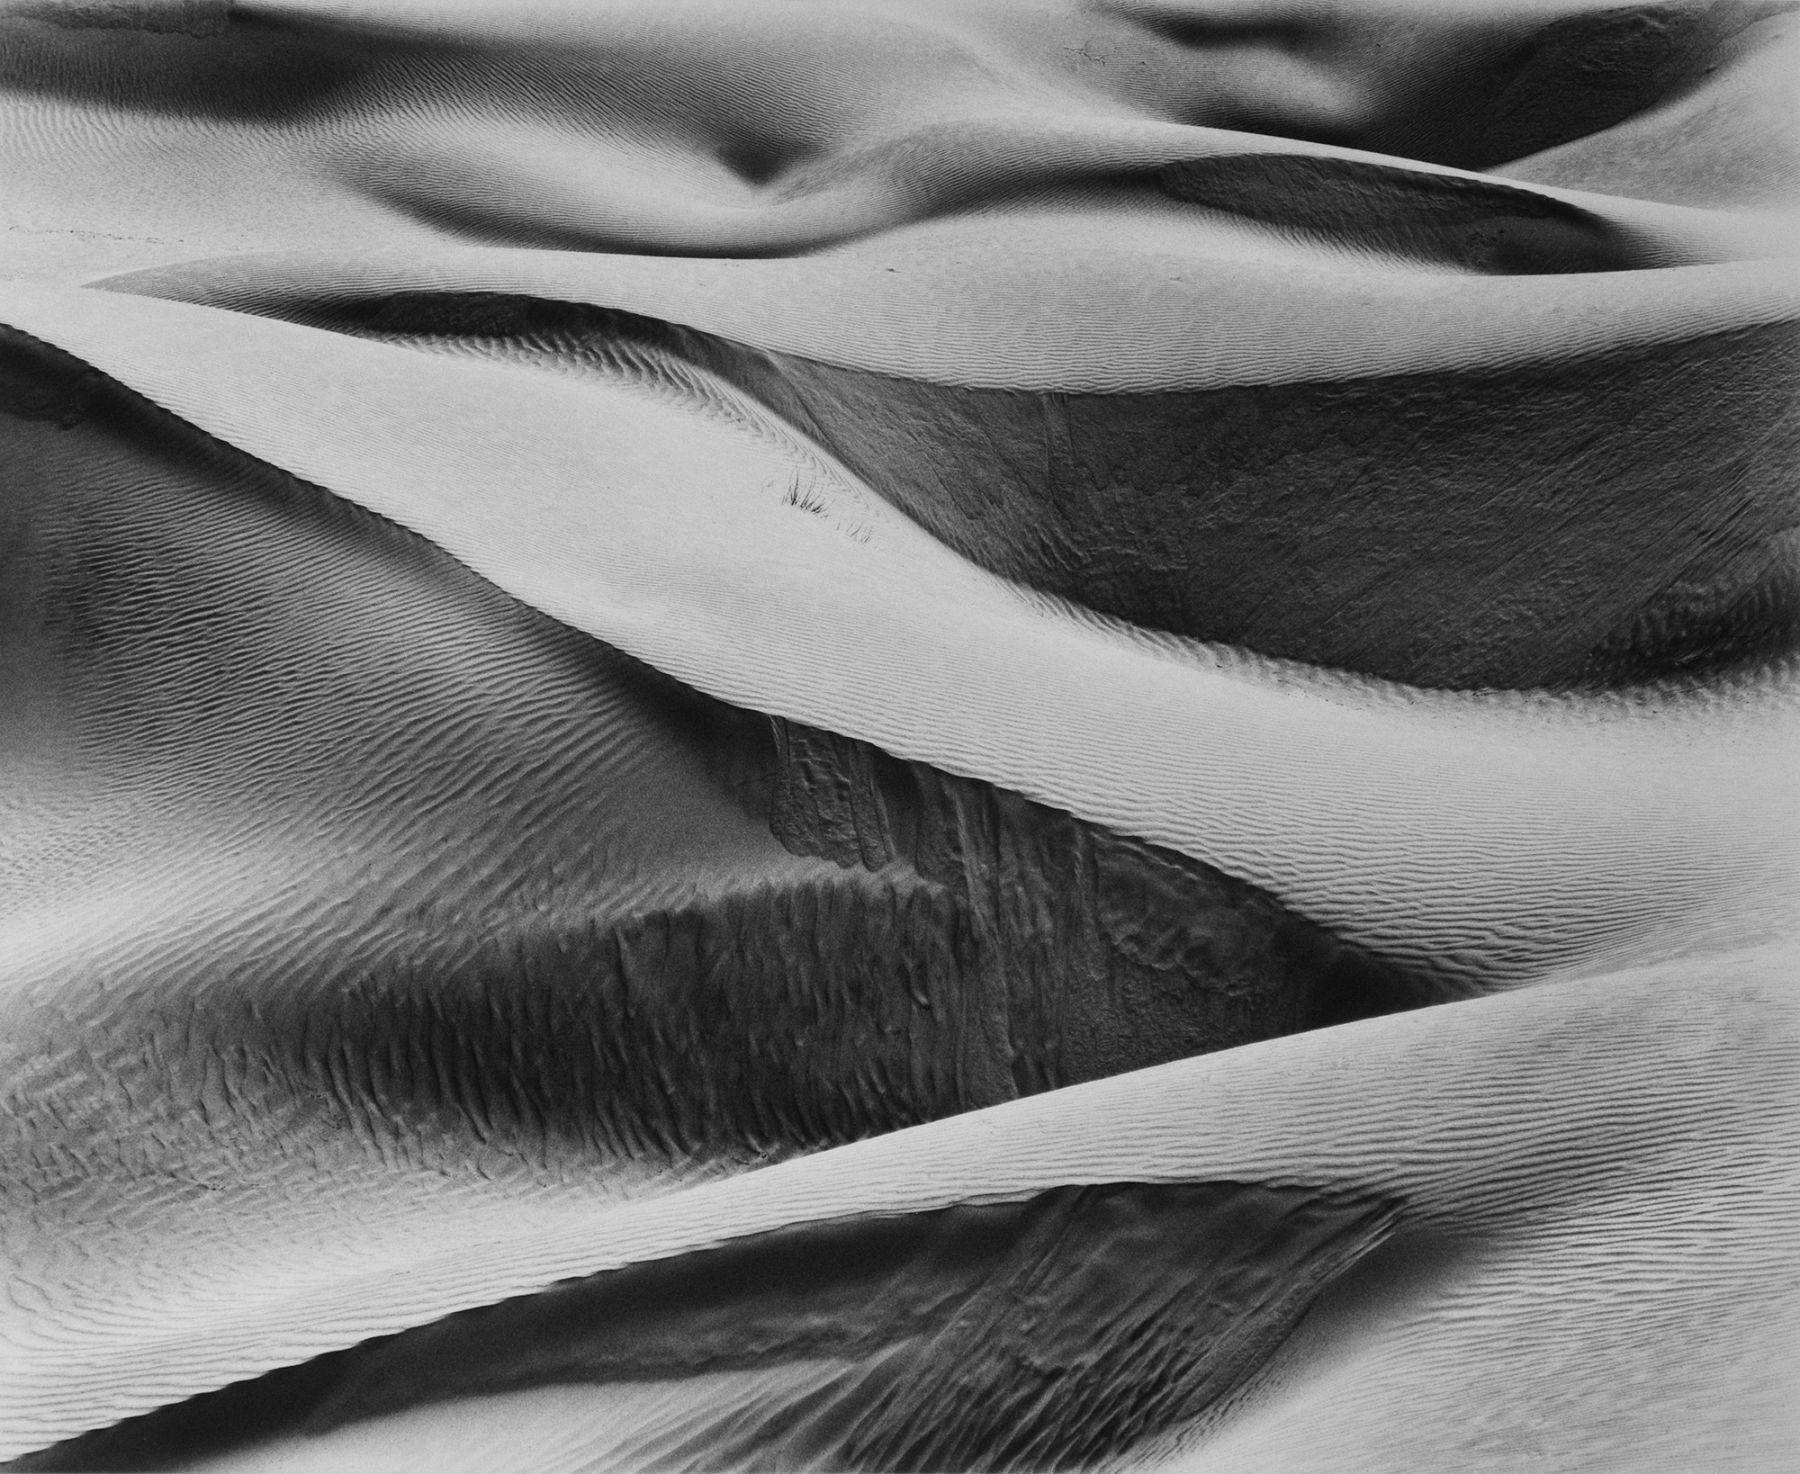 Rollicking Dunes, 2010, Silver Gelatin Photograph